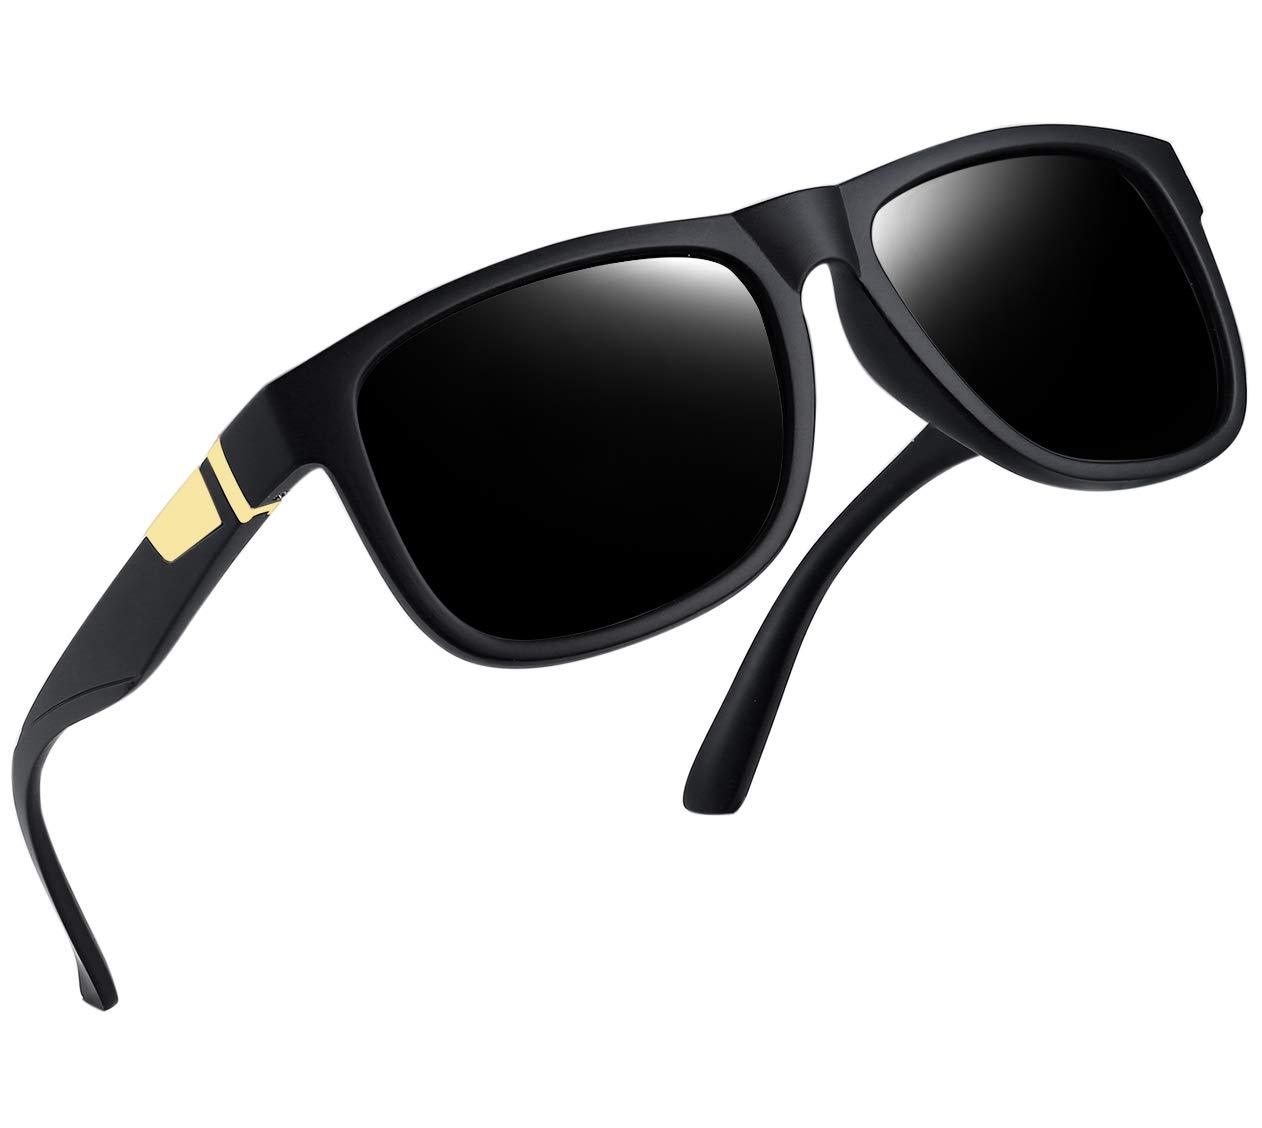 a320dd9af9 Unisex Polarized Sunglasses Men Women Square Frame Sun Glasses 100% UV  Protection (Matte Black